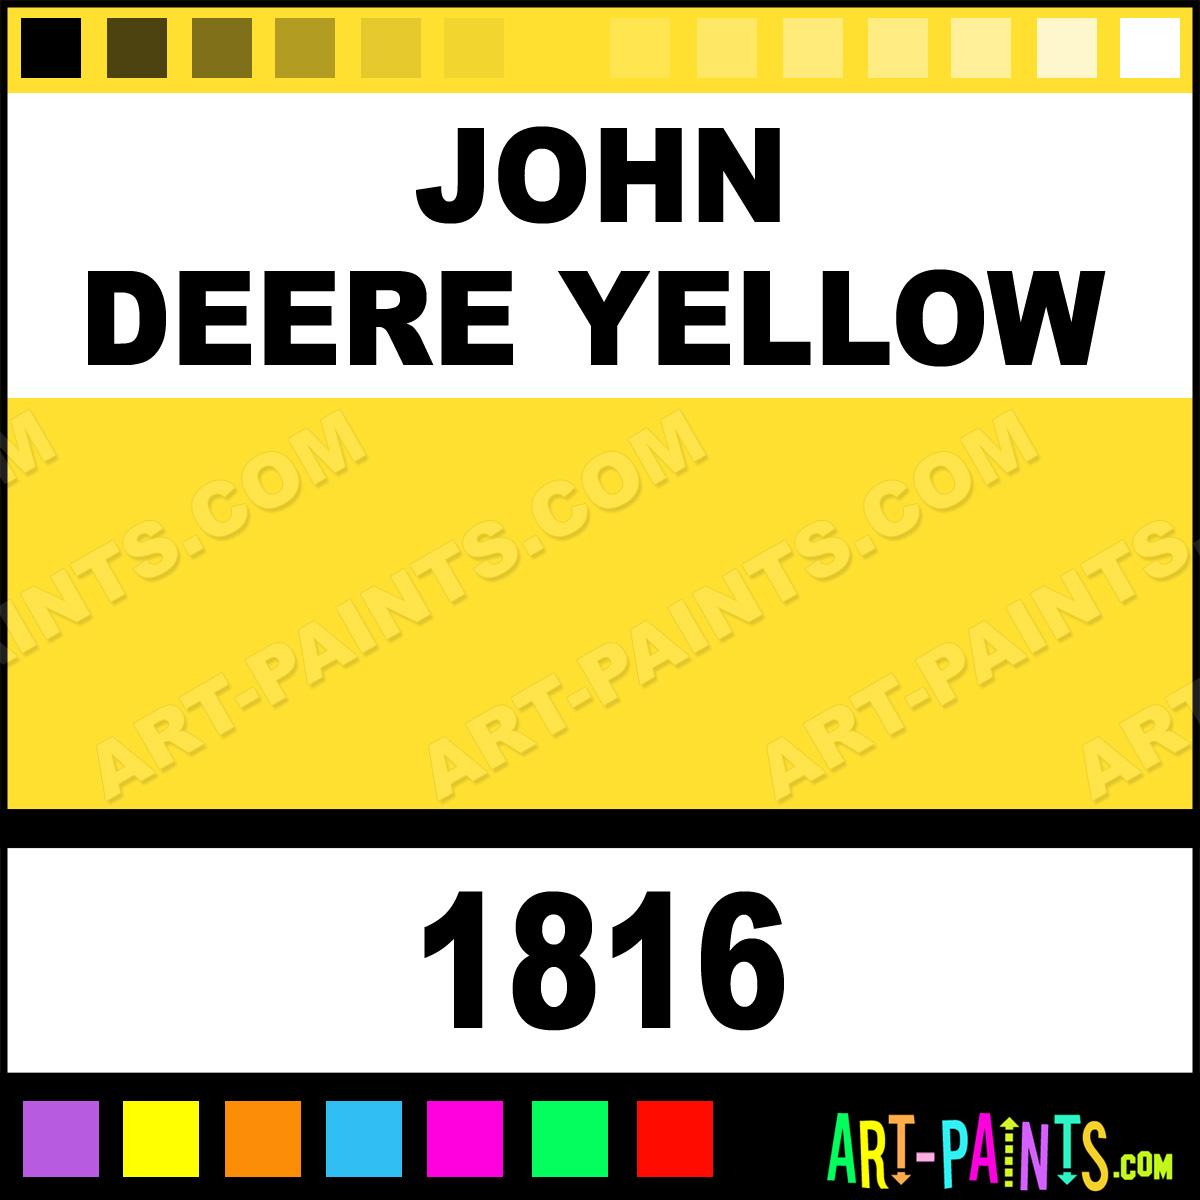 spray paints 1816 john deere yellow paint john deere yellow. Black Bedroom Furniture Sets. Home Design Ideas